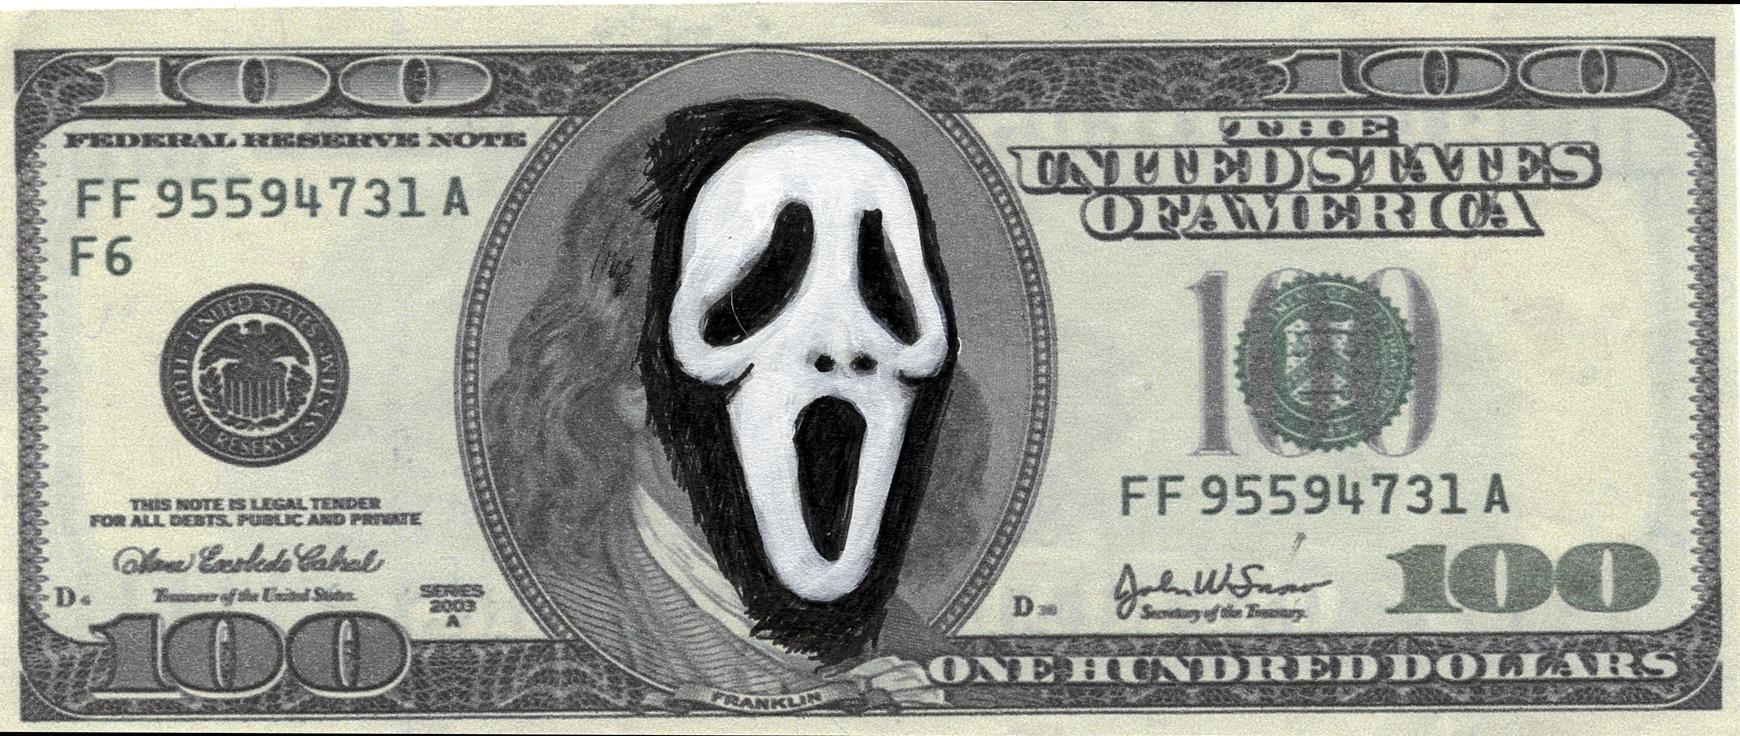 Scream  Mixed Media - 2.5 x 6in - 2011